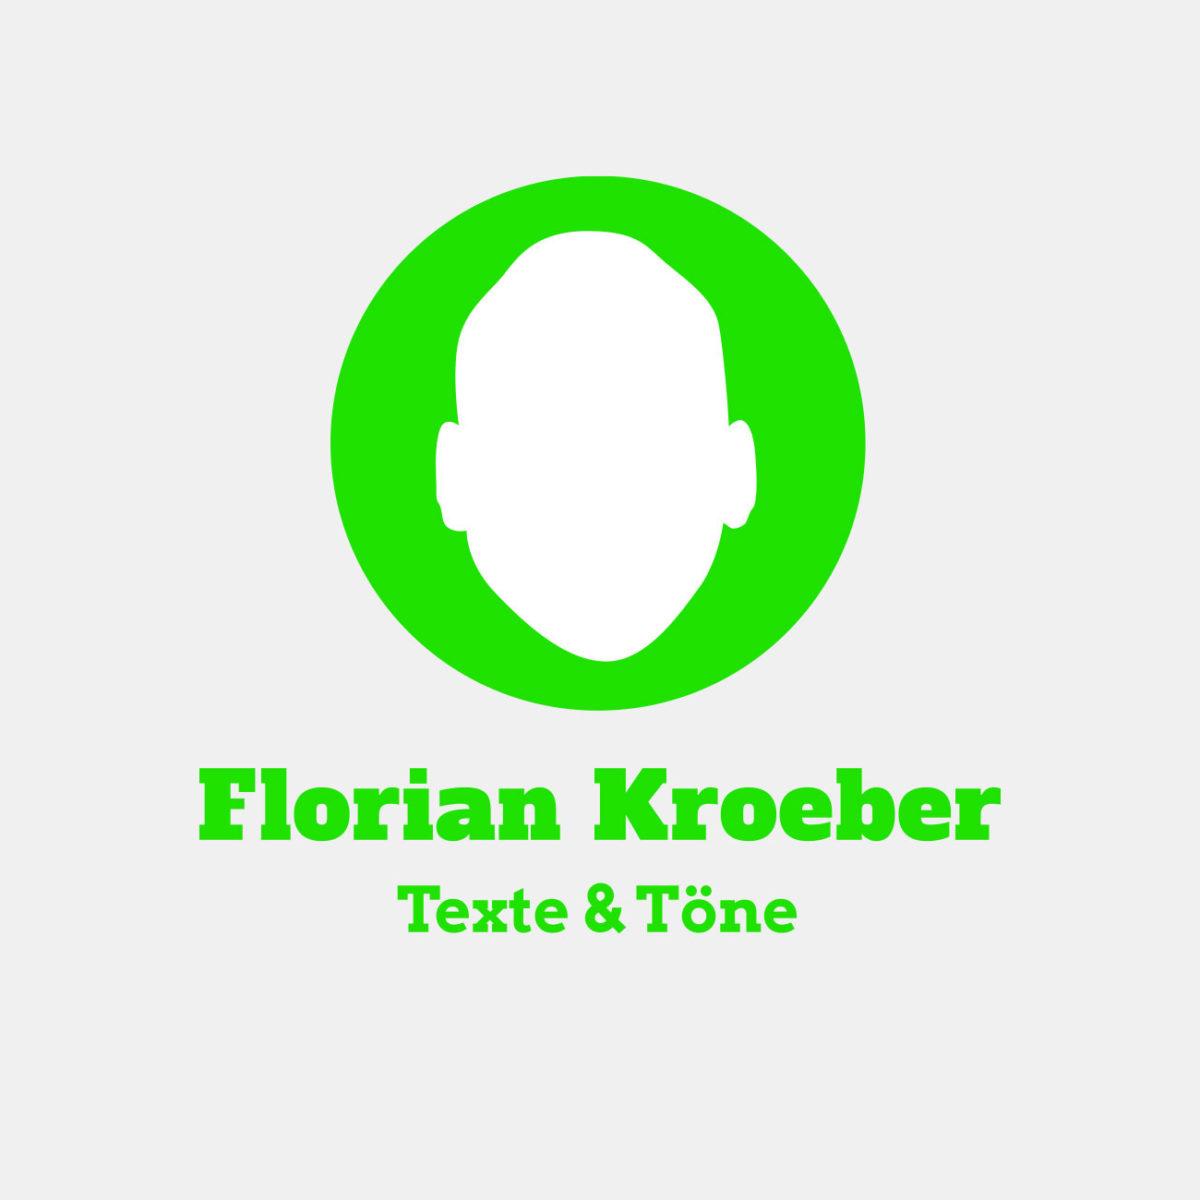 Florian Kroeber Logodesign